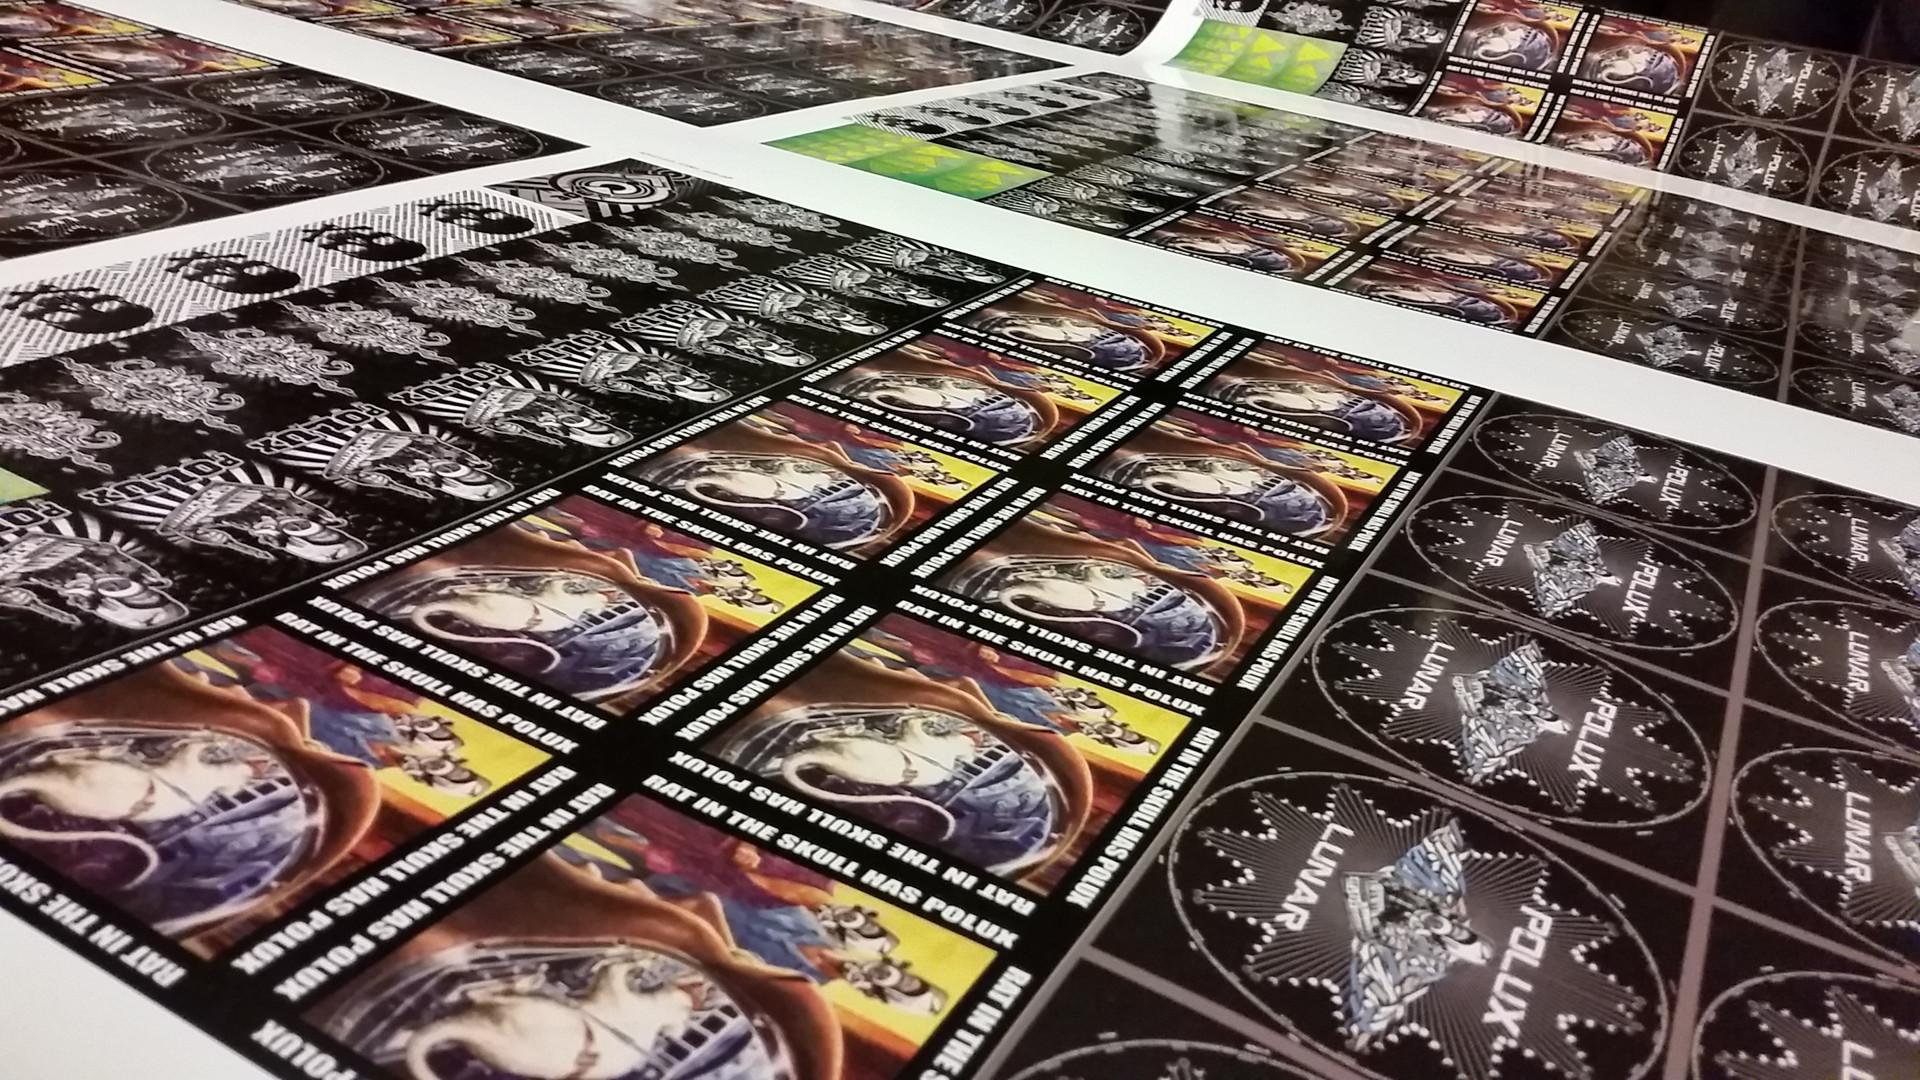 Impression stickers vinyl